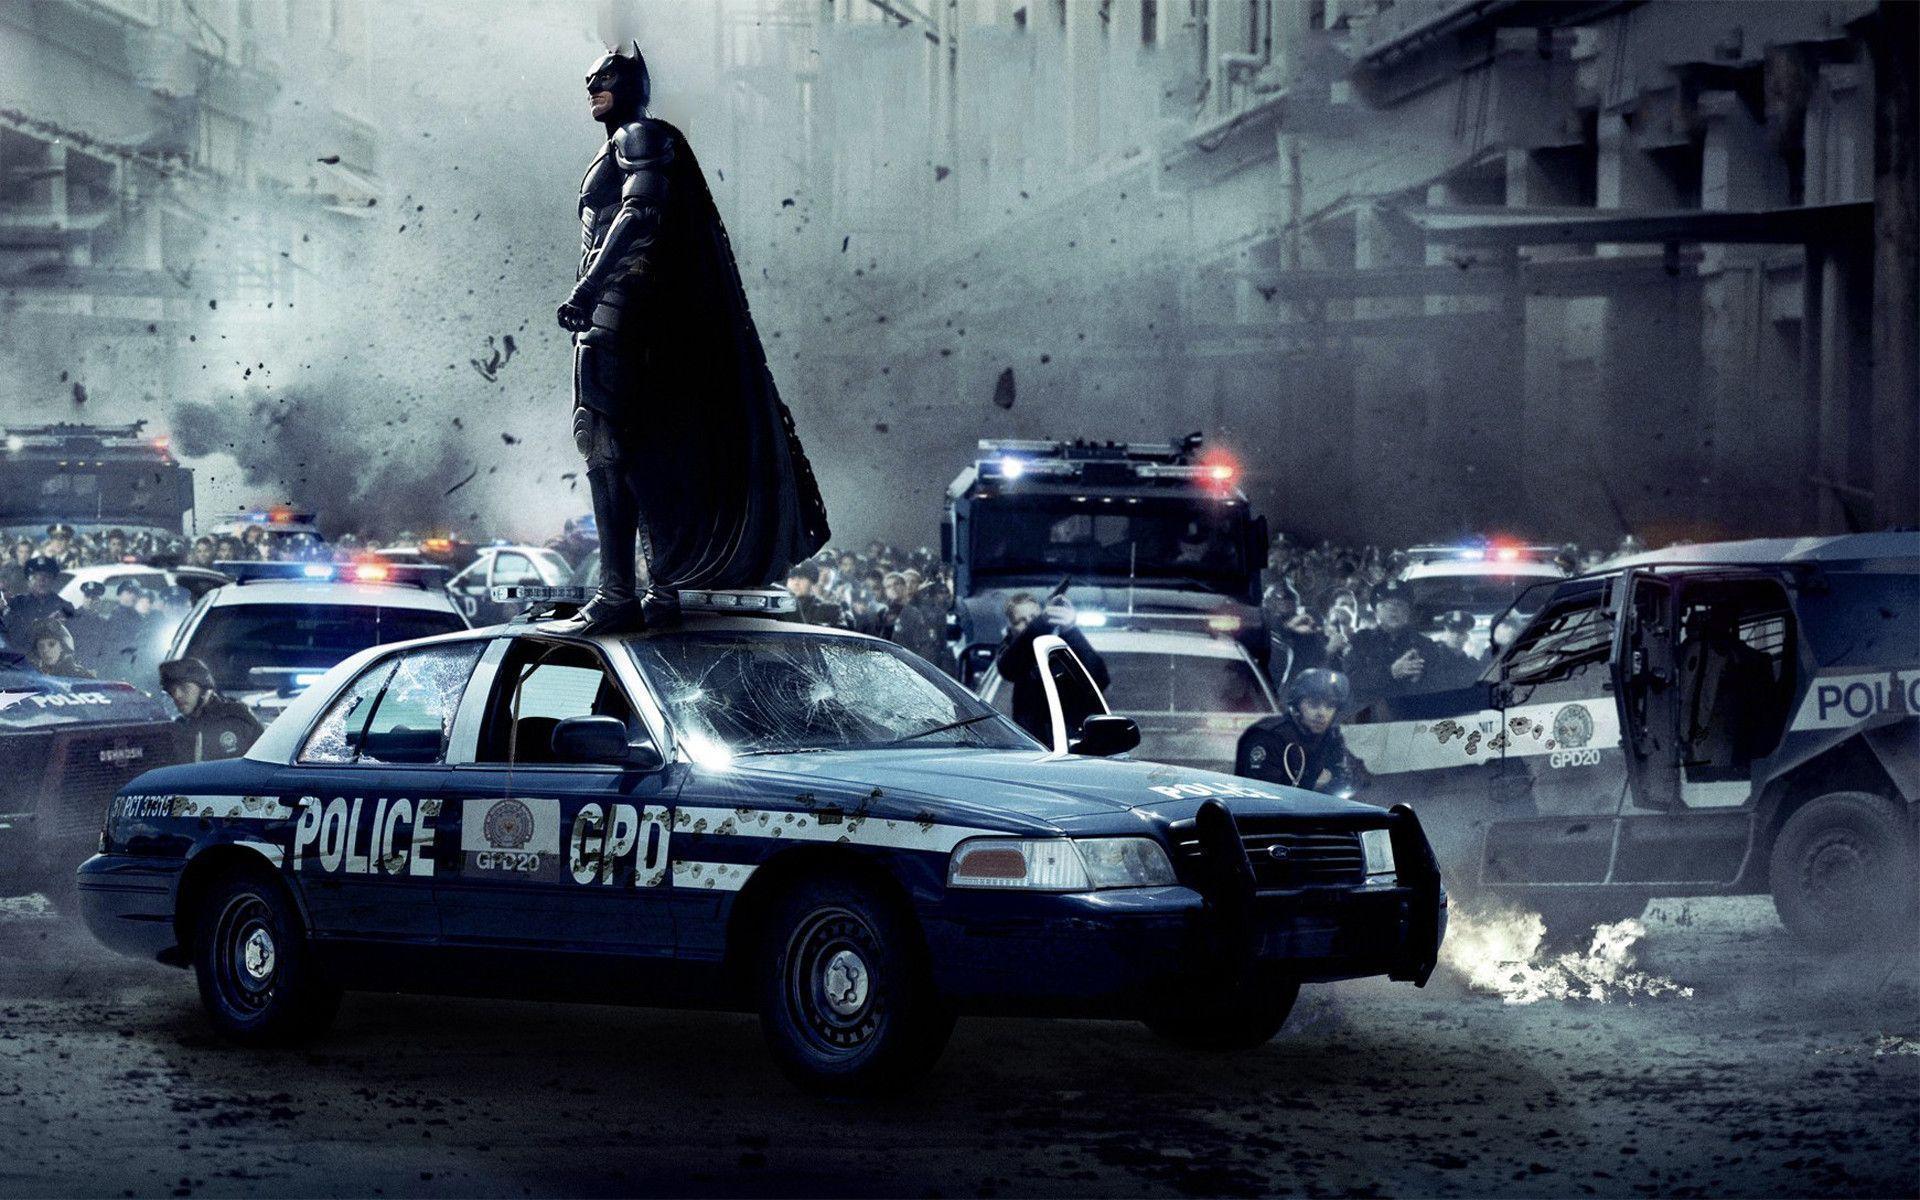 160 The Dark Knight Rises Wallpapers | The Dark Knight Rises ...